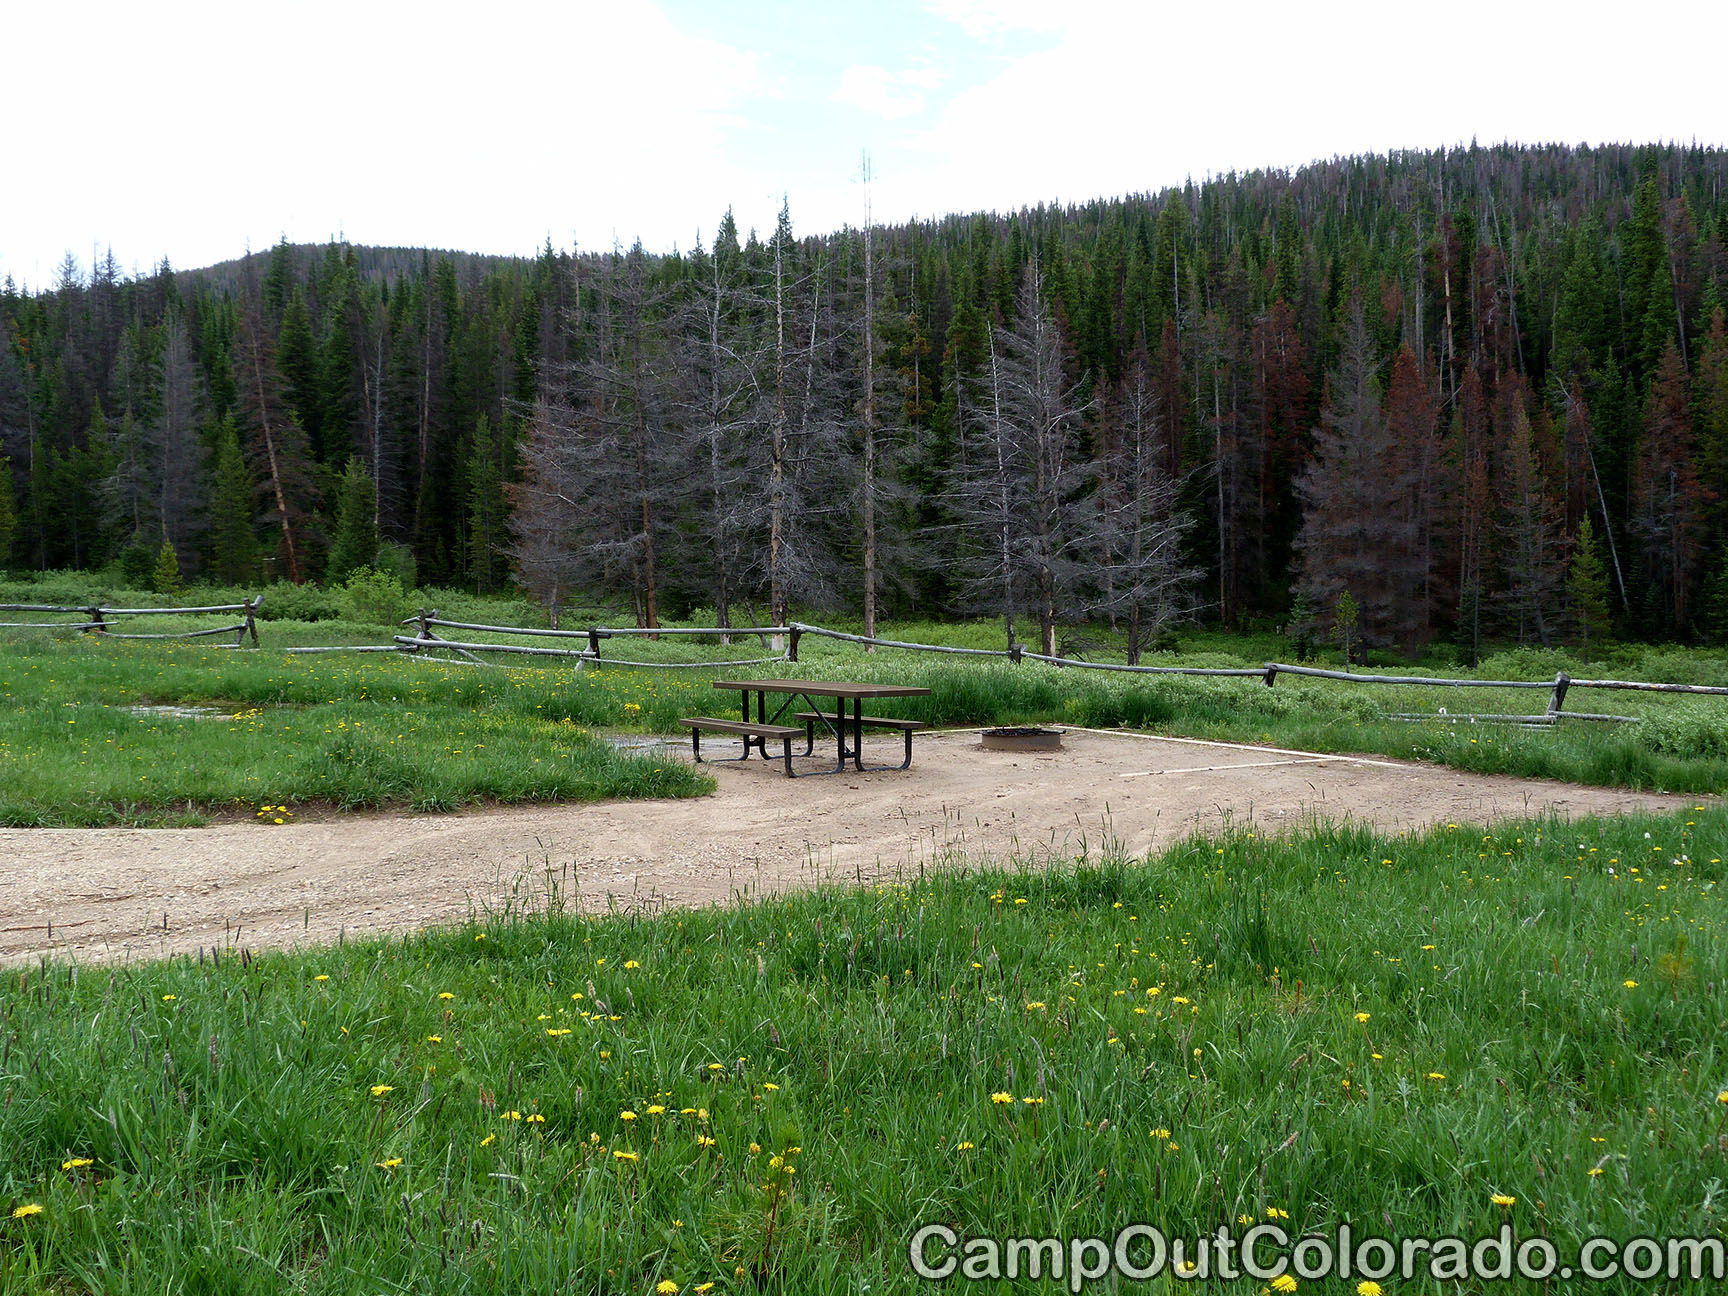 Camp-out-colorado-bockman-campground-camper-spot